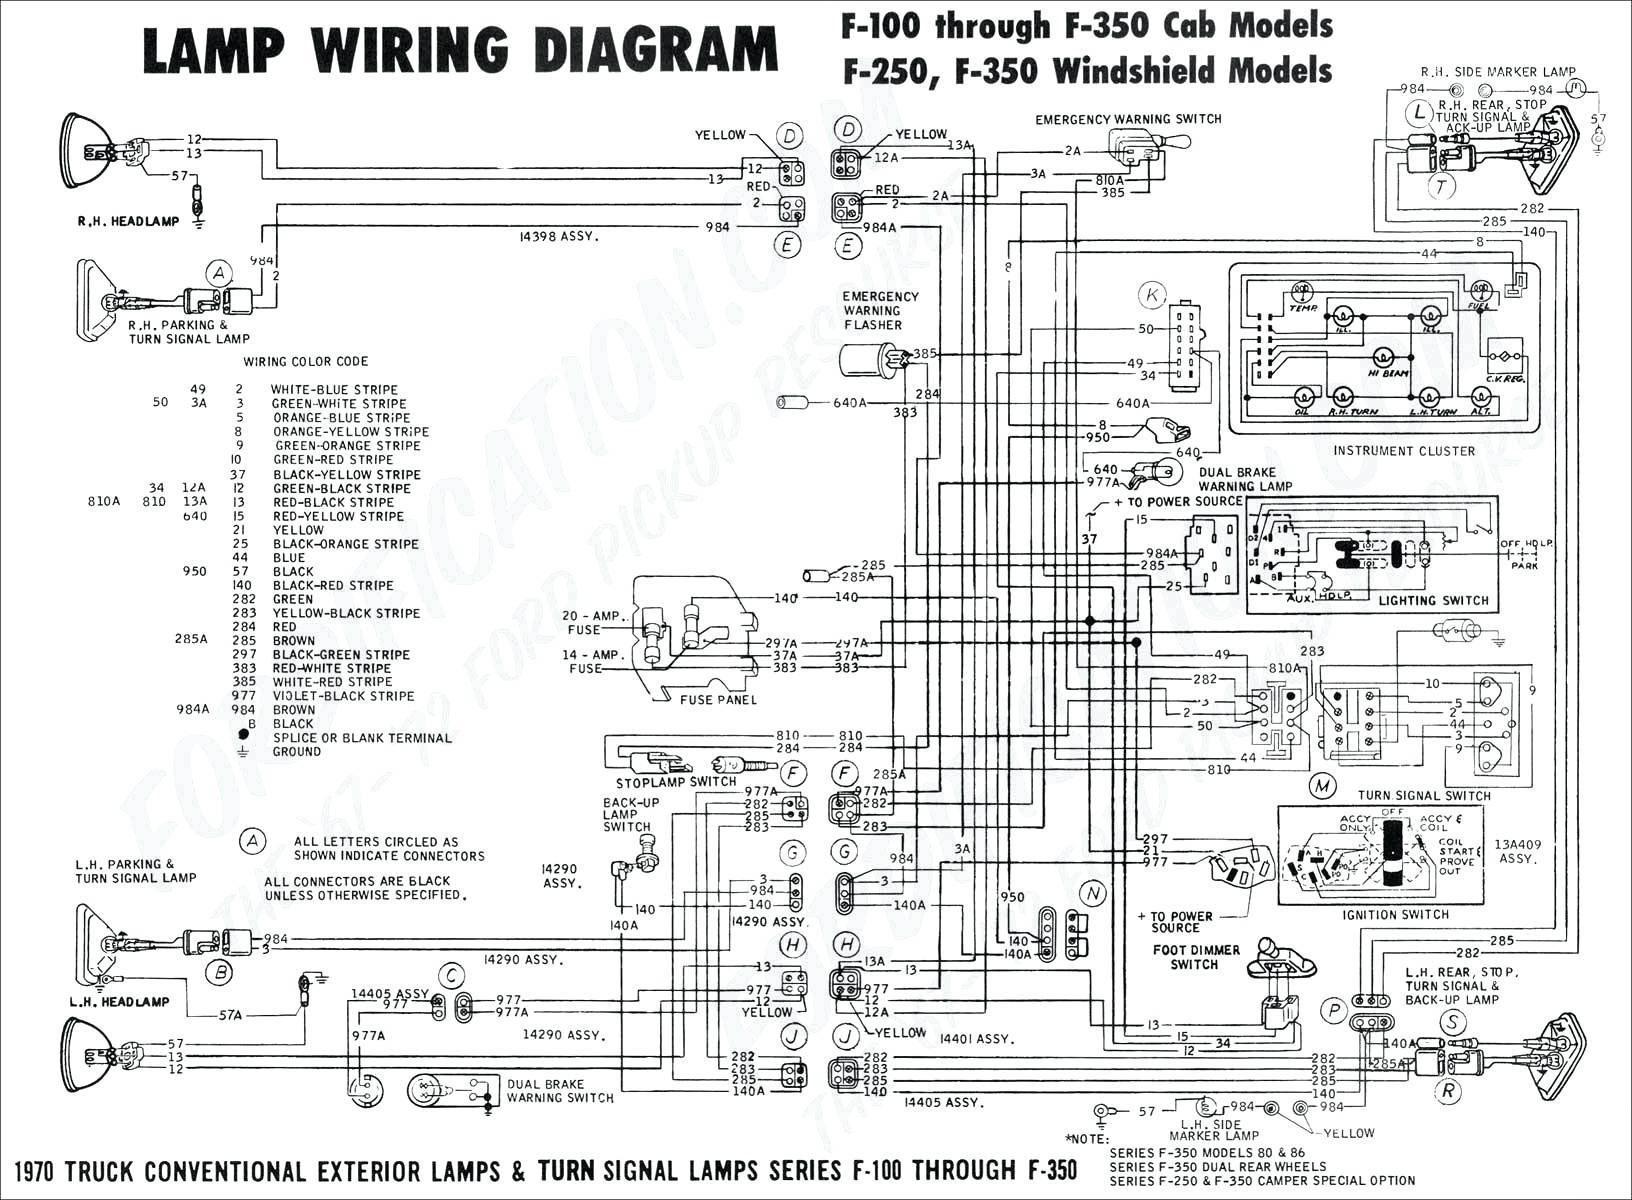 toyota corolla fog light wiring diagram wiring diagram car fog lights new wiring diagram trailer lights fresh wiring diagram trailer australia 5j